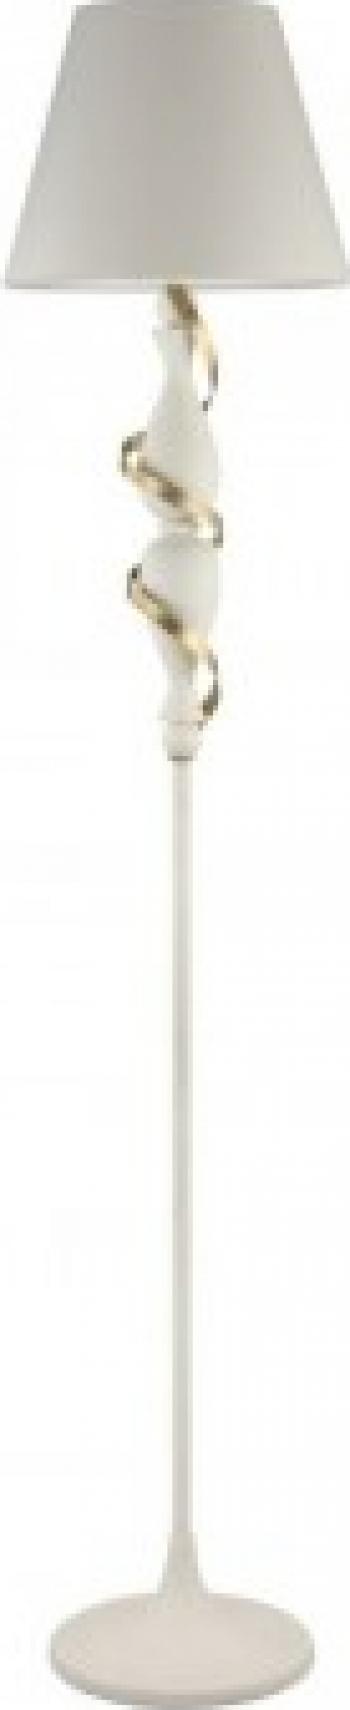 LAMPADAR INTRECCIO ARM010-01-W